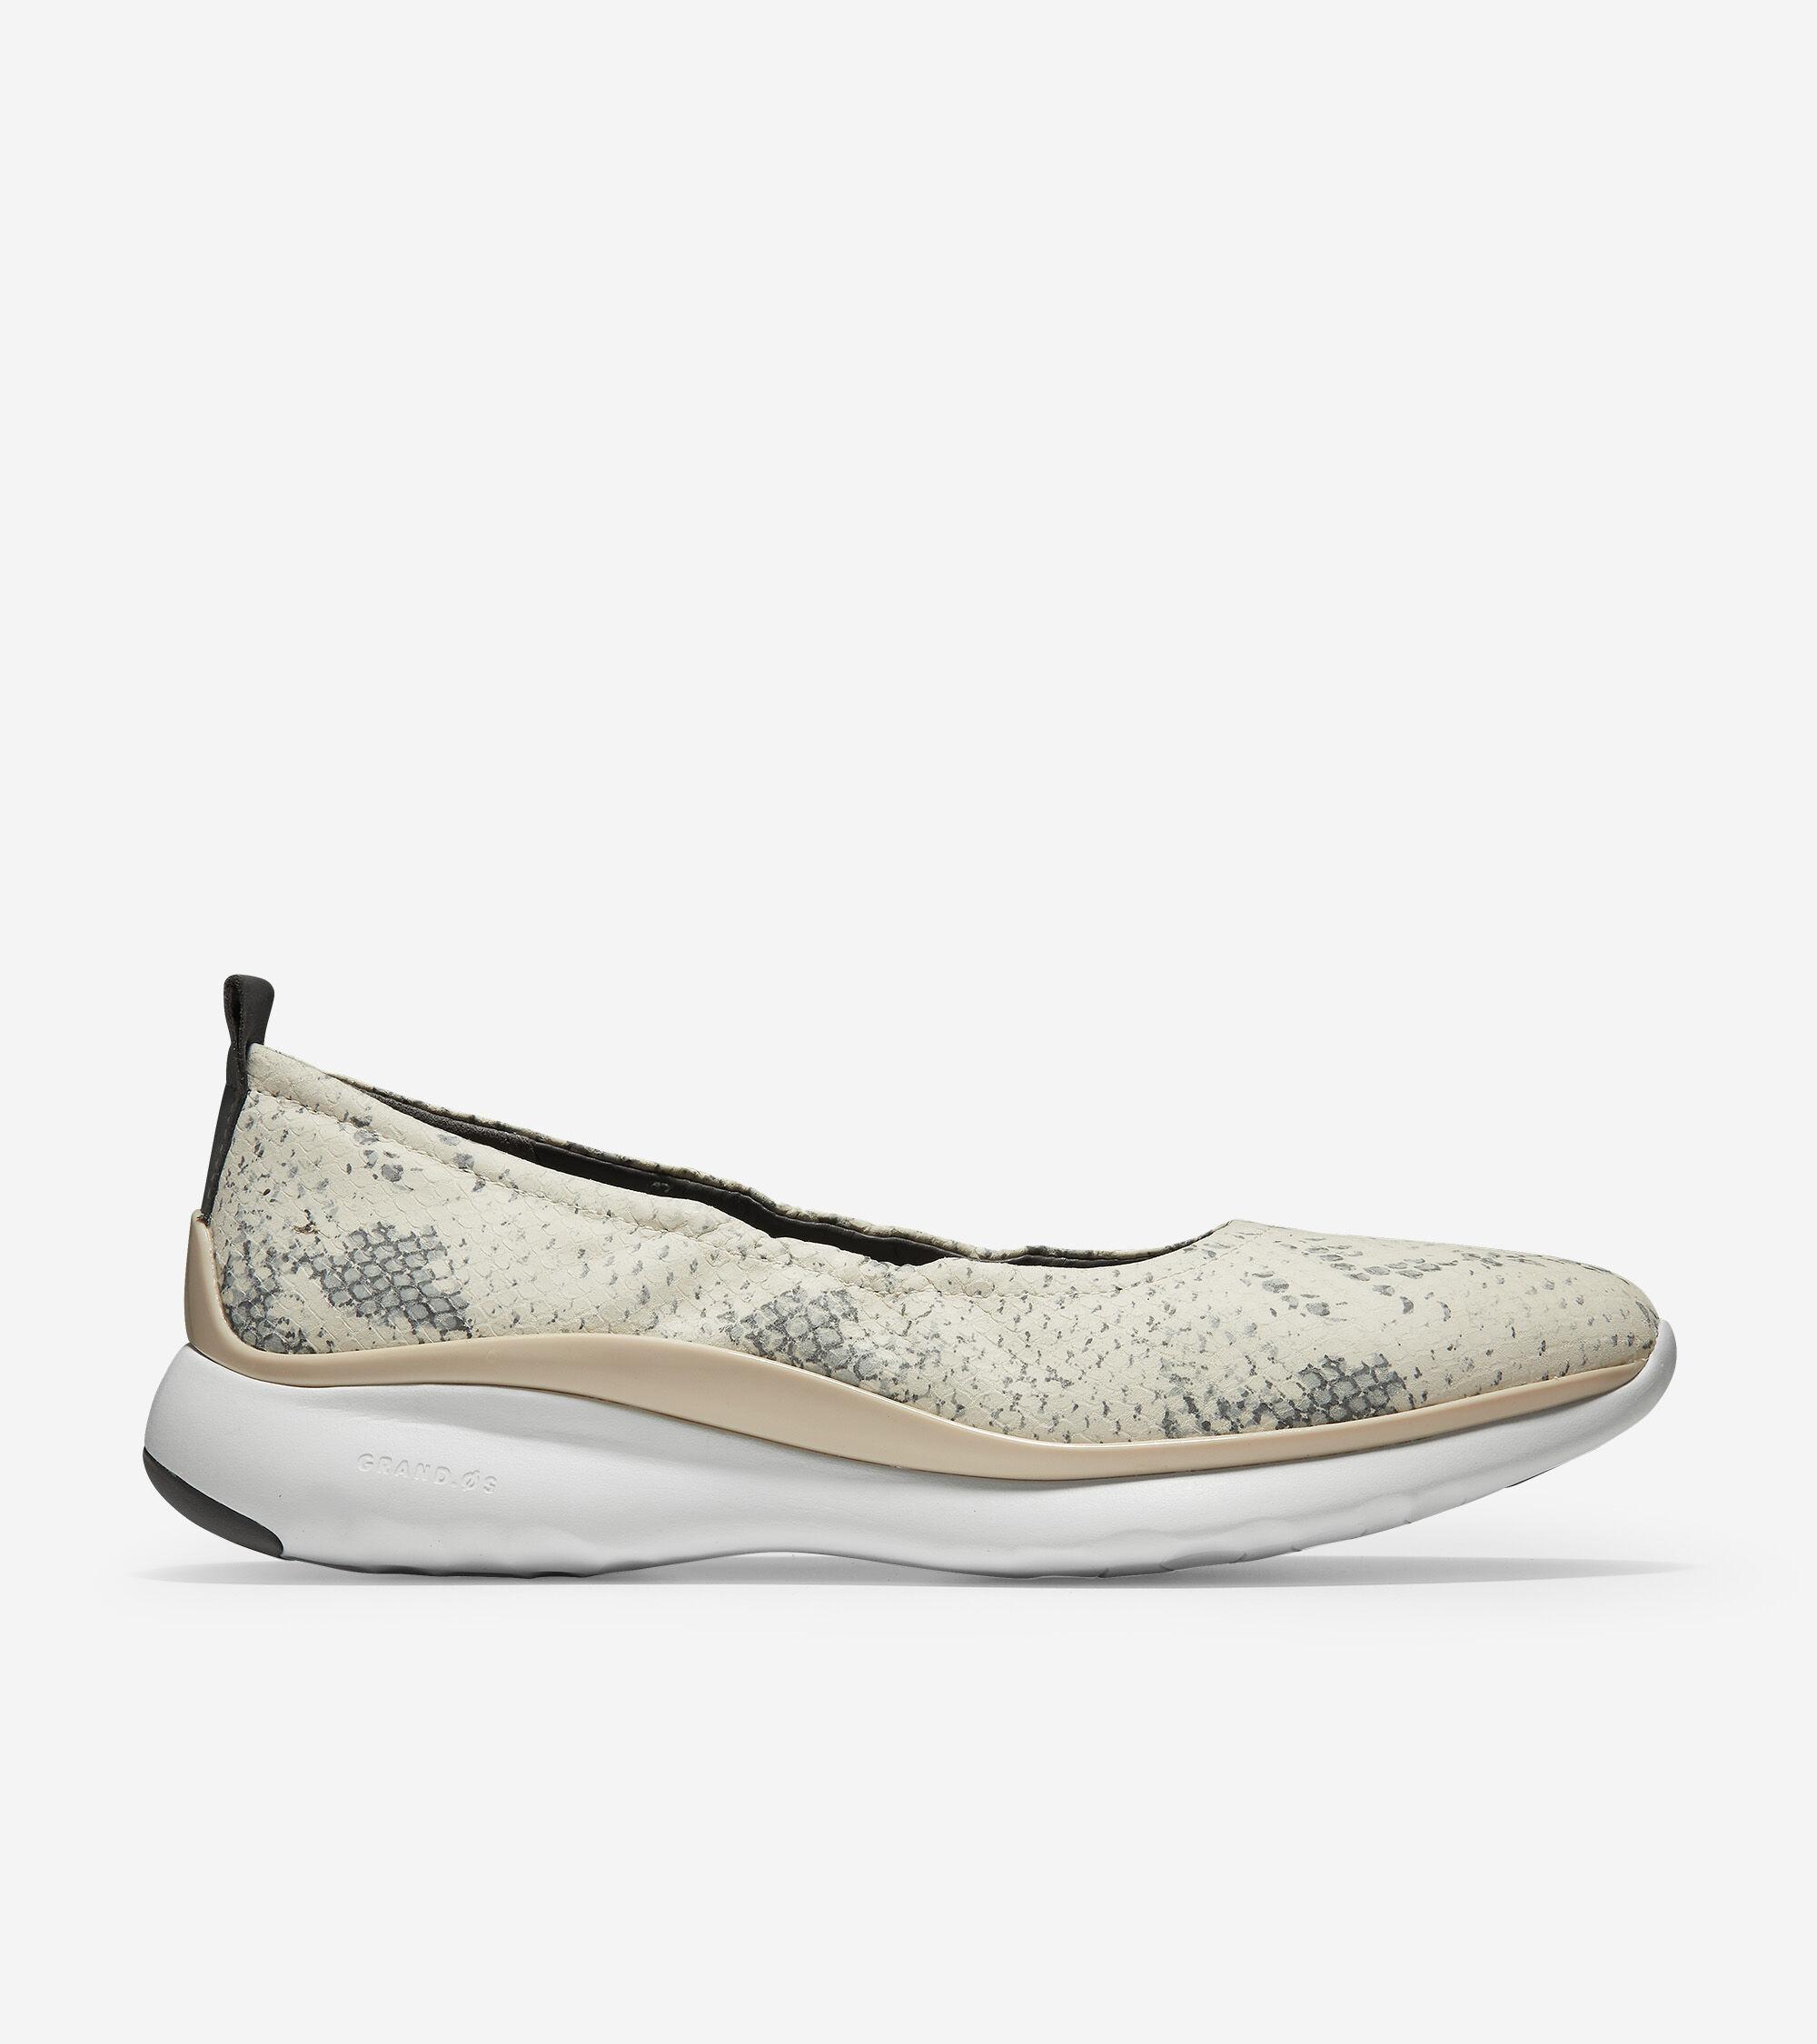 Cole Haan Women's 3.ZEROGRAND Rouched Slip-on Ballet Flat